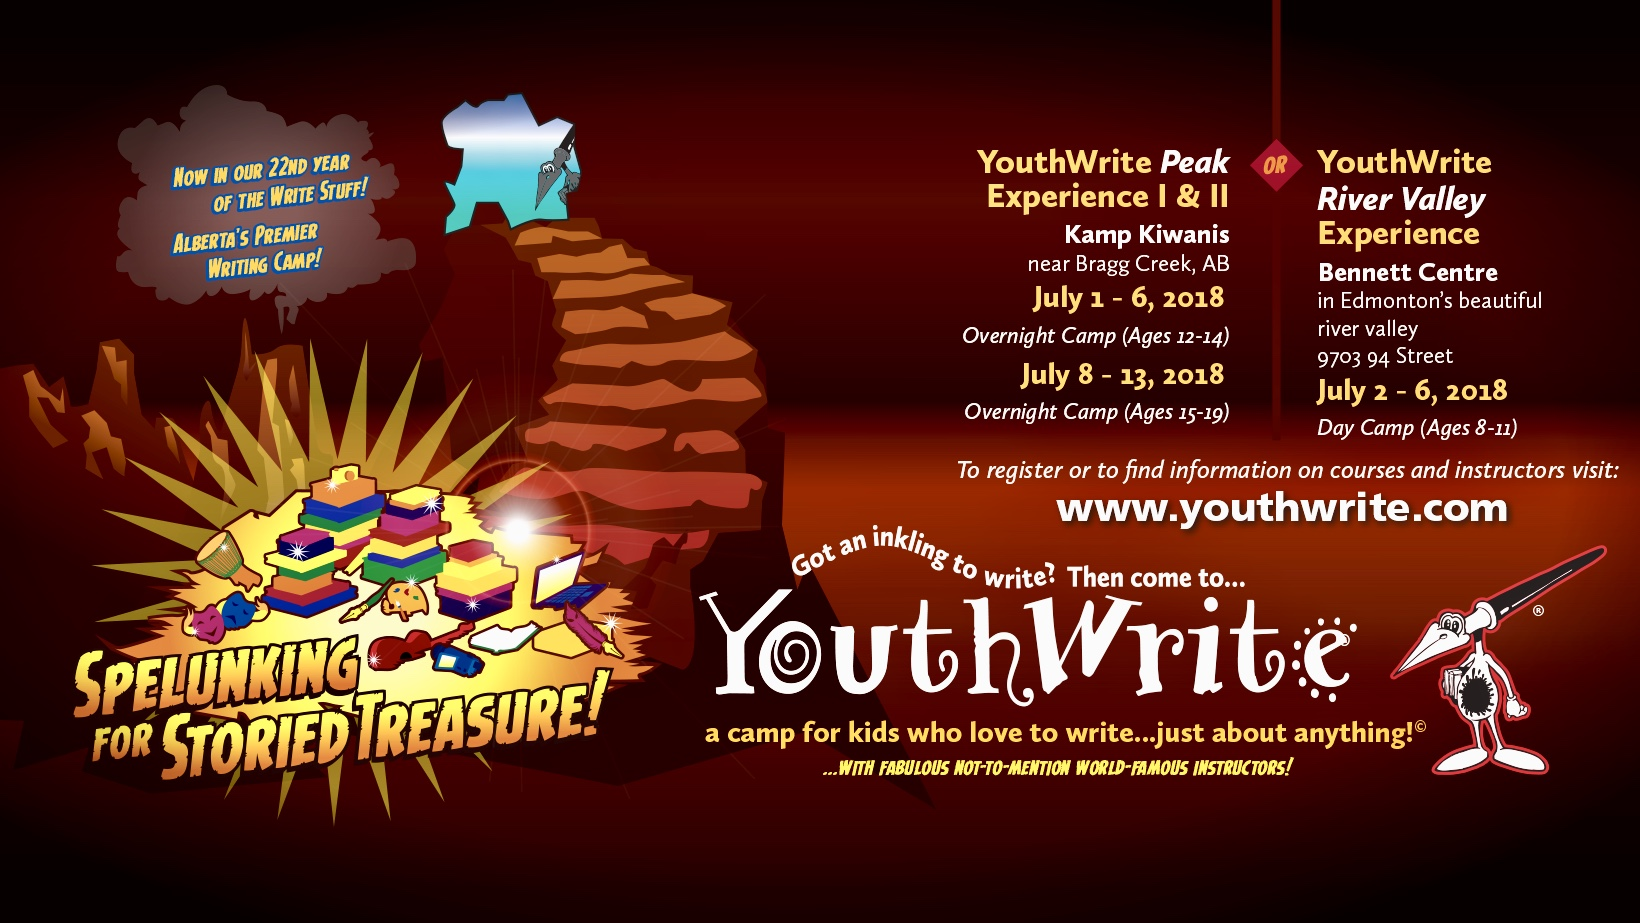 Youthwrite peak ii experience 2018 malvernweather Choice Image